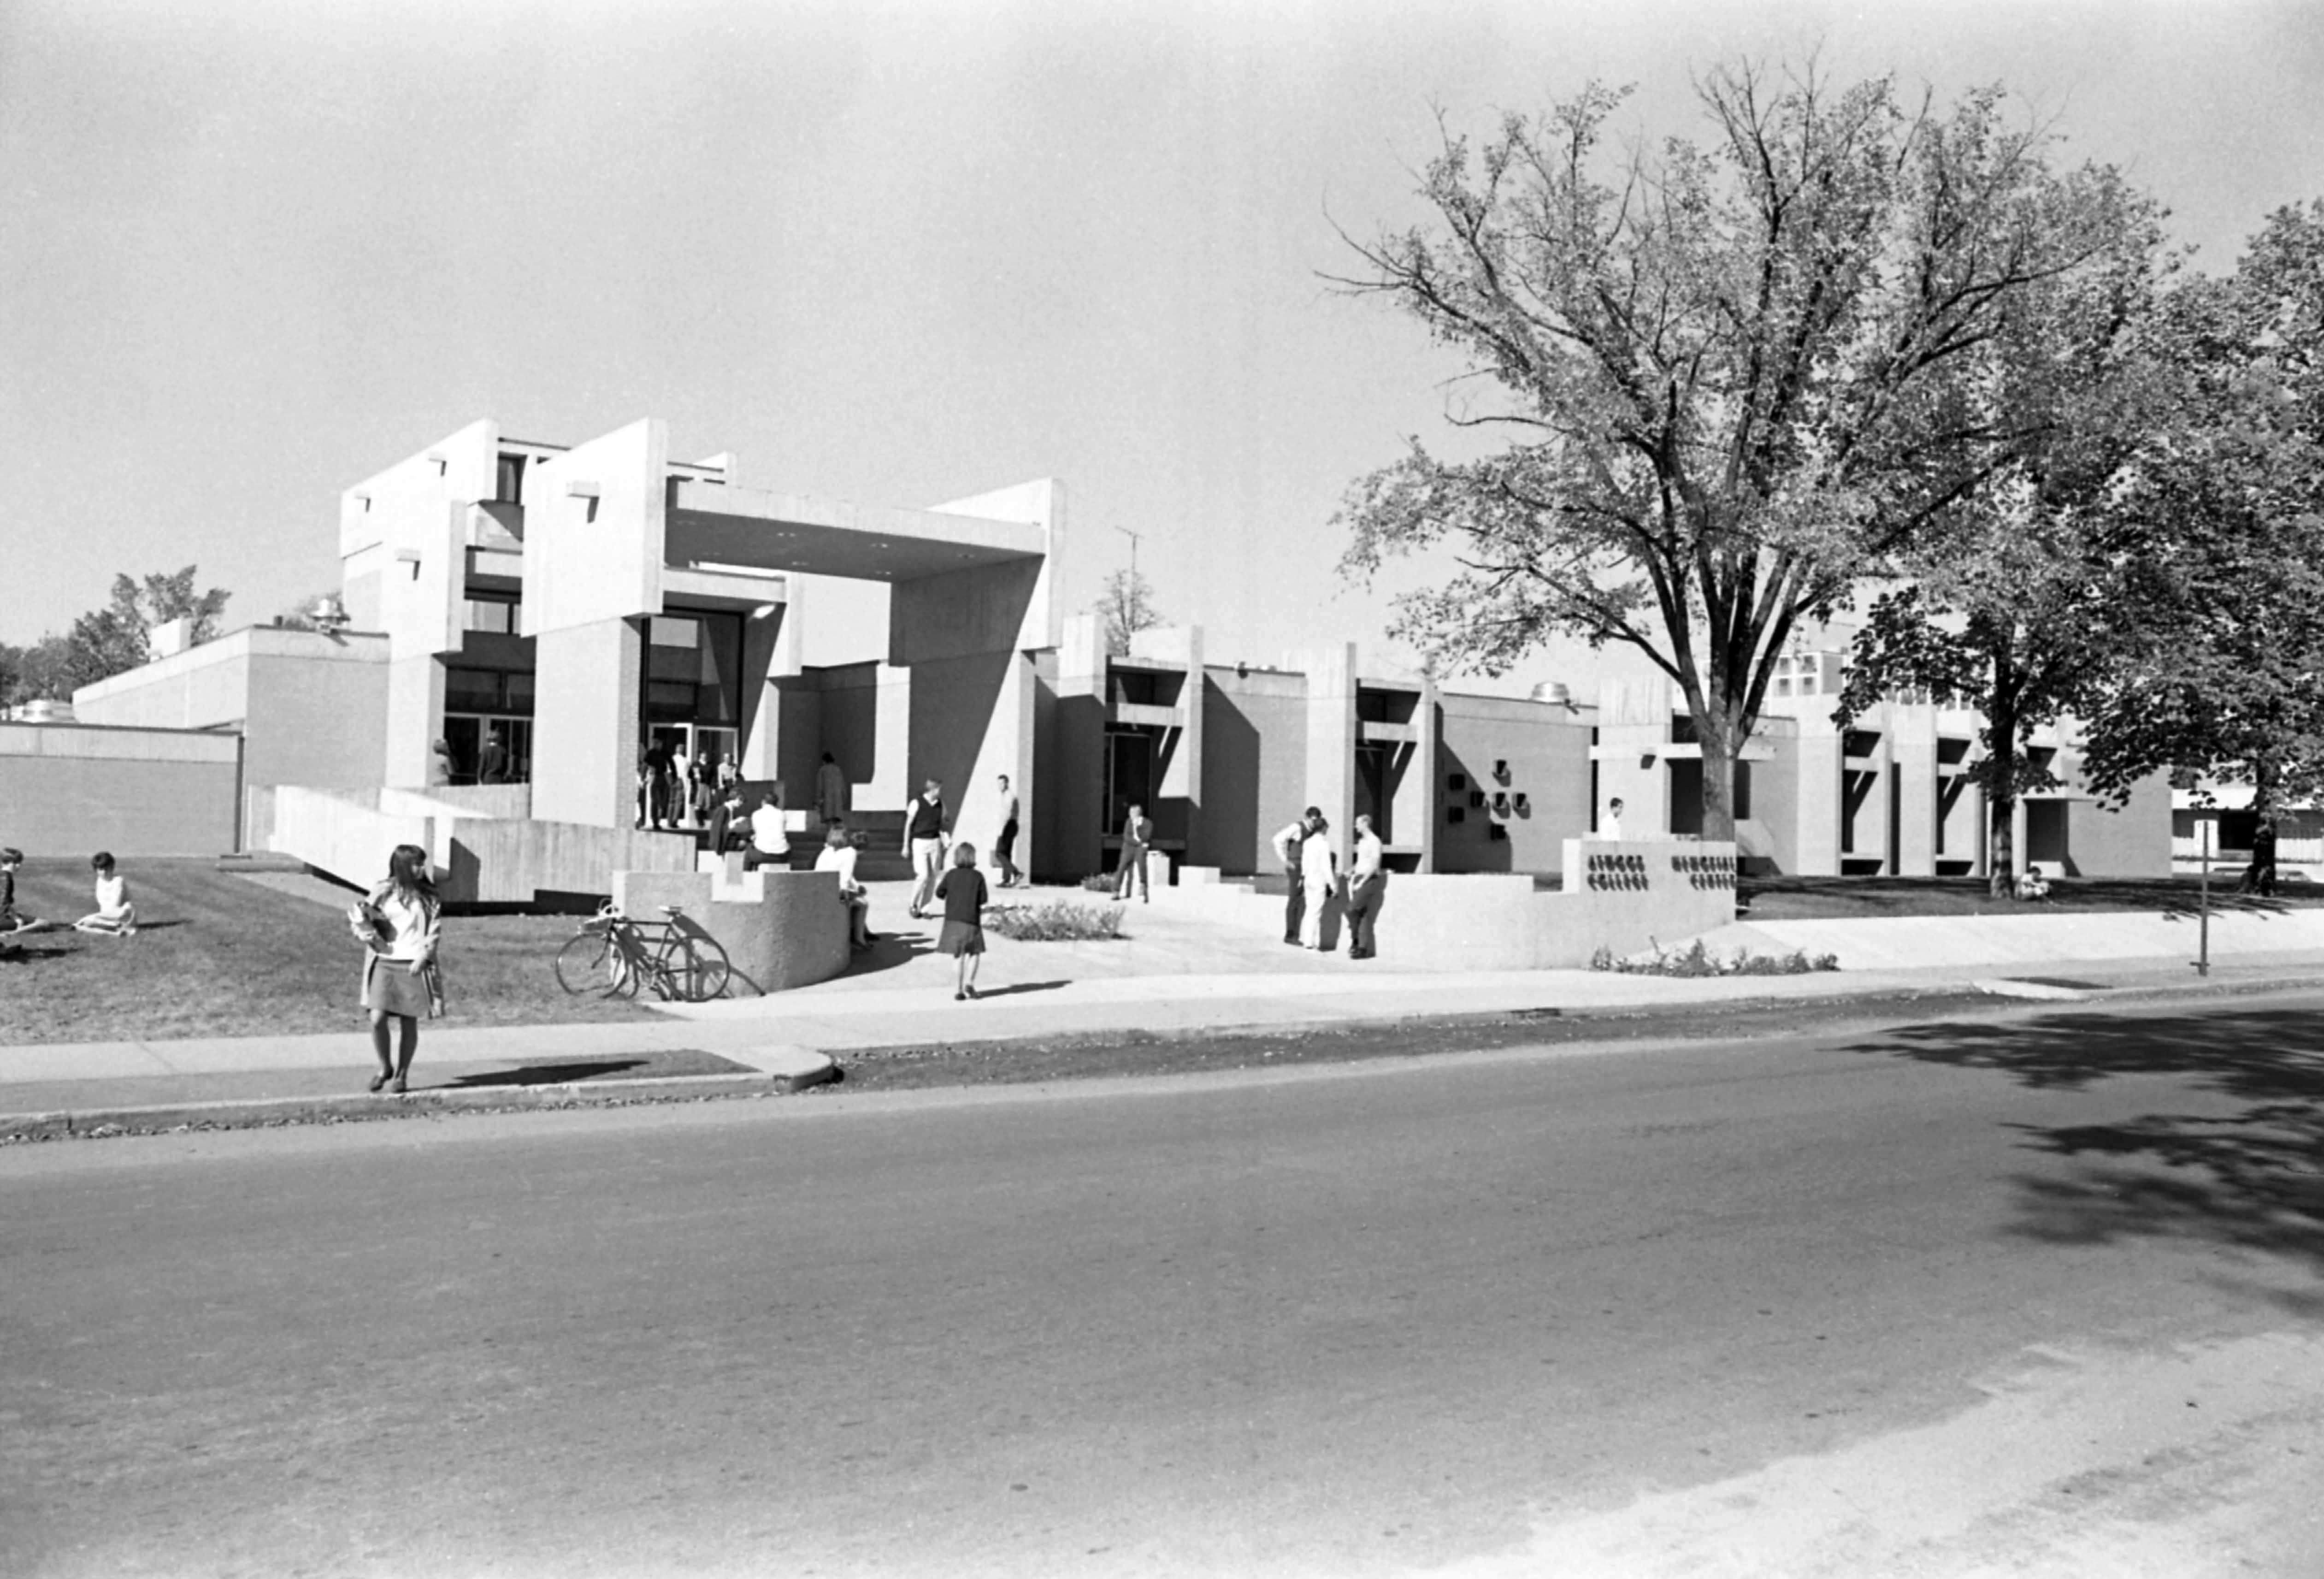 Atwood Memorial Center, 1966